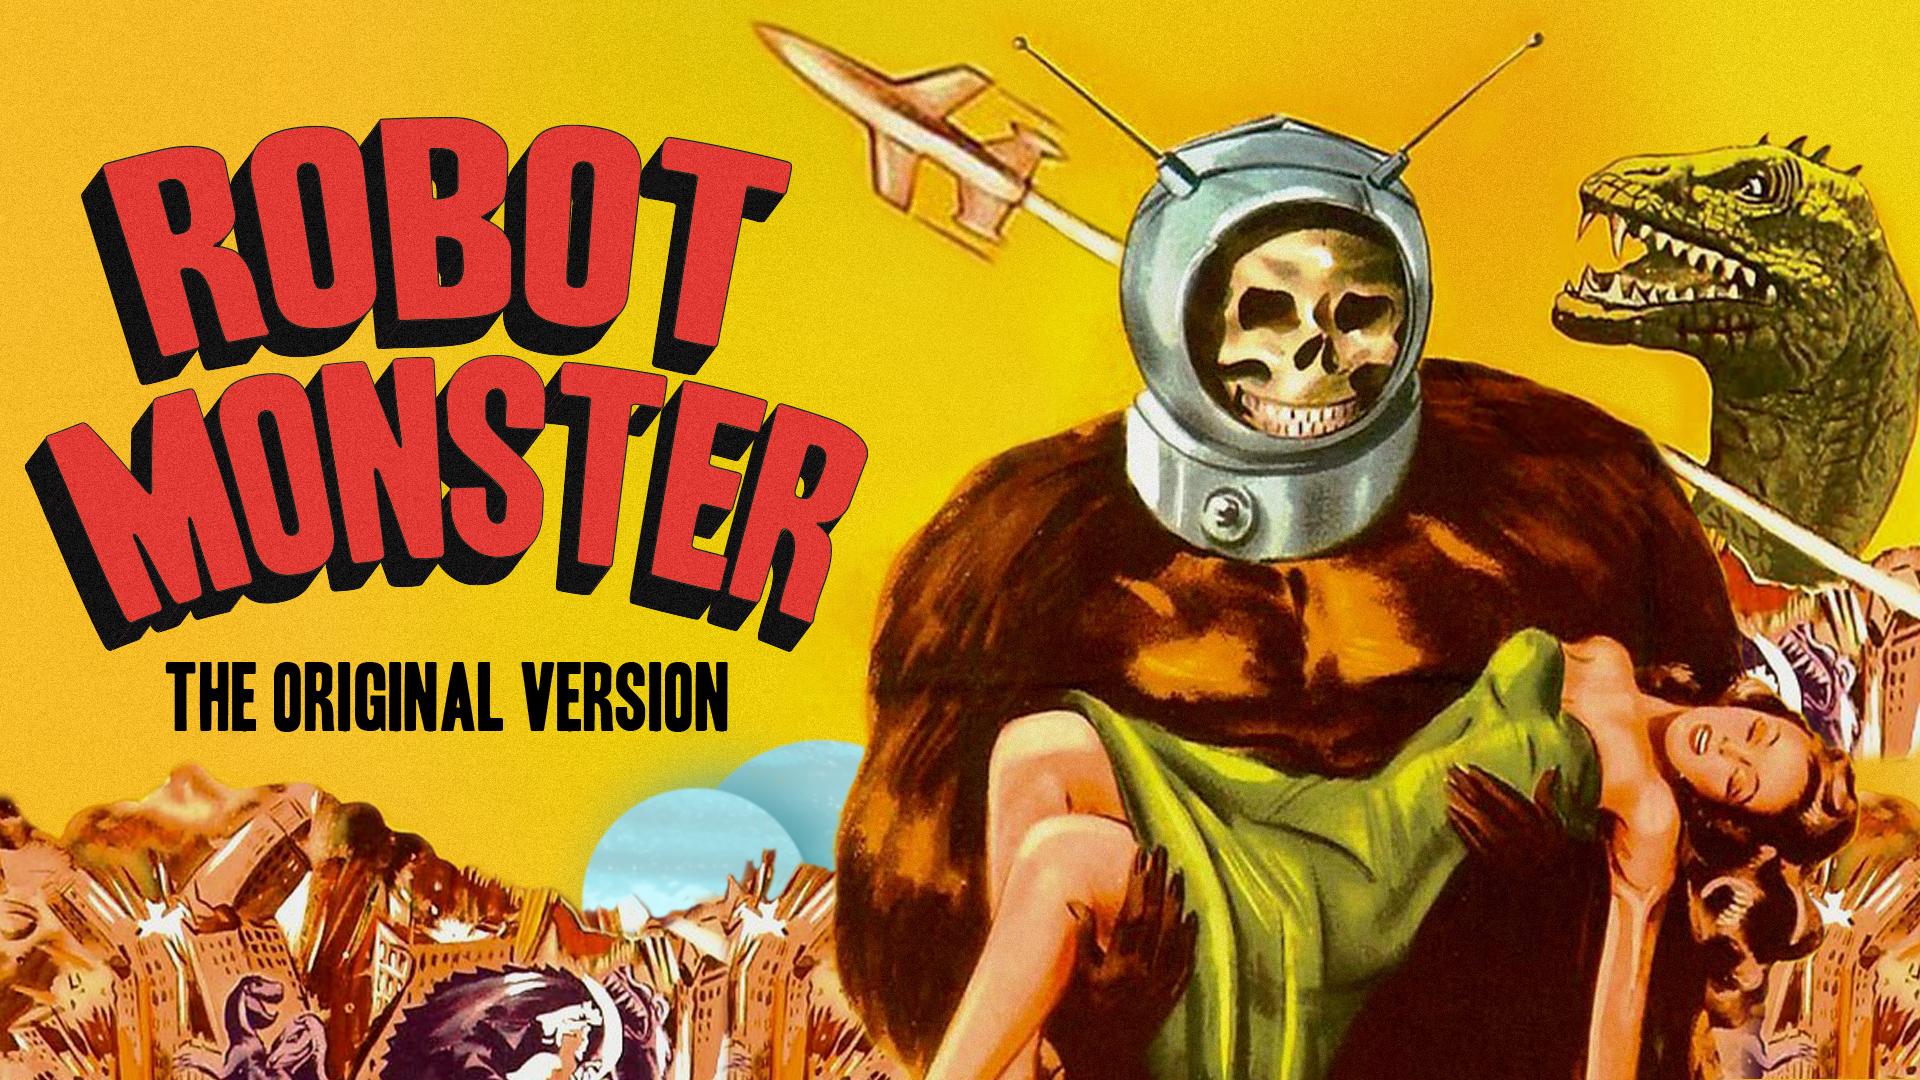 Robot Monster - The Original Version